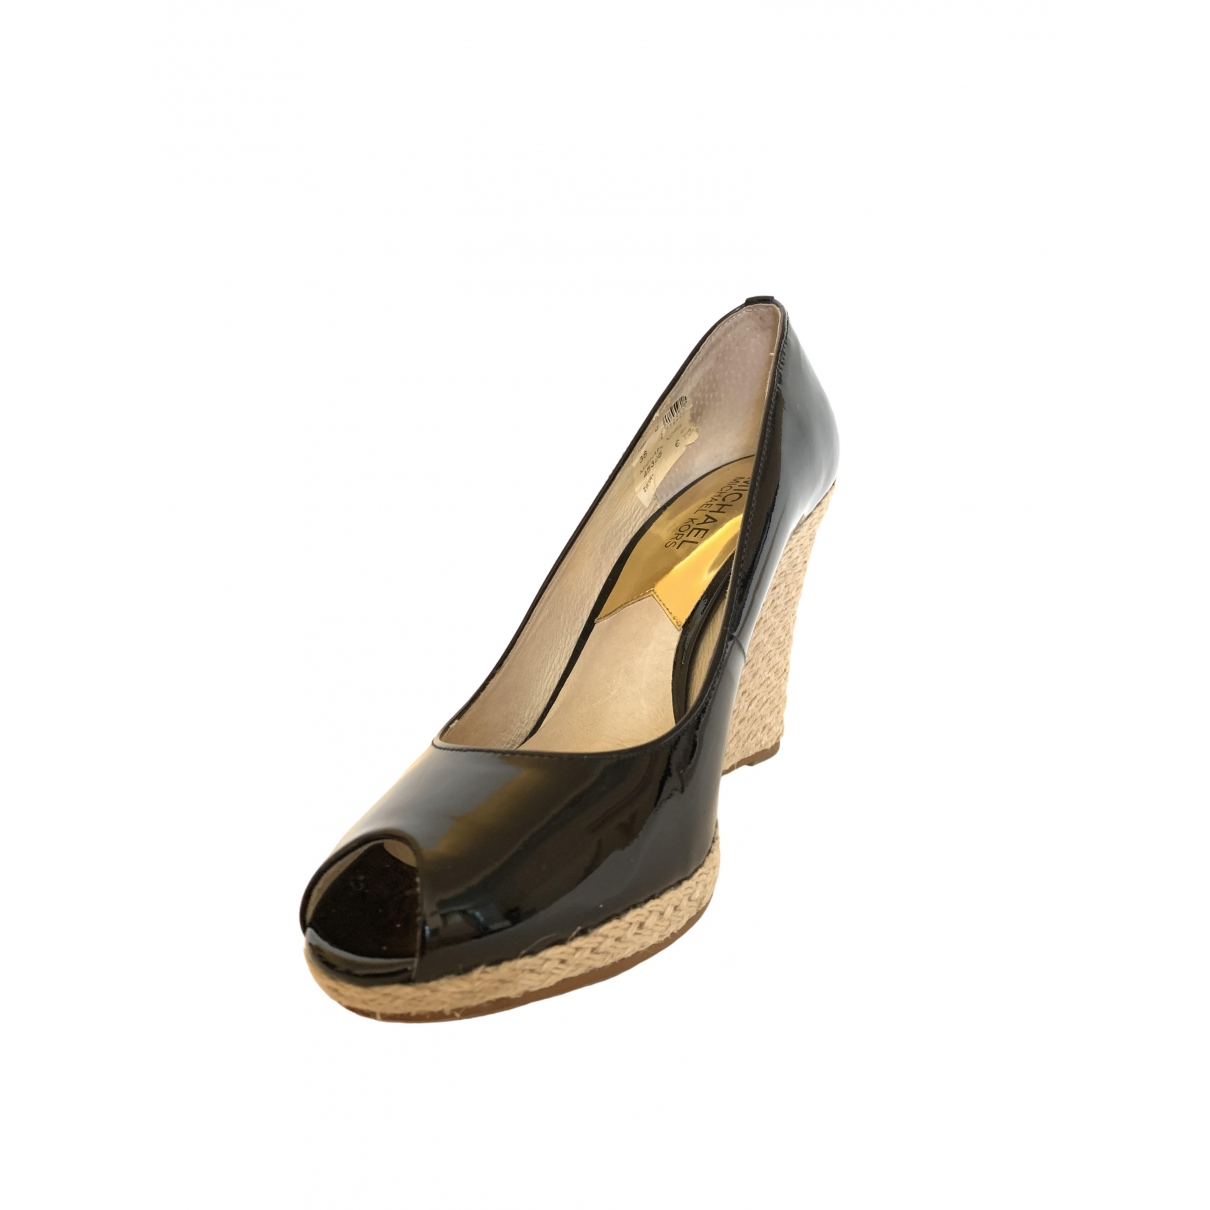 Michael Kors \N Black Patent leather Heels for Women 38 EU